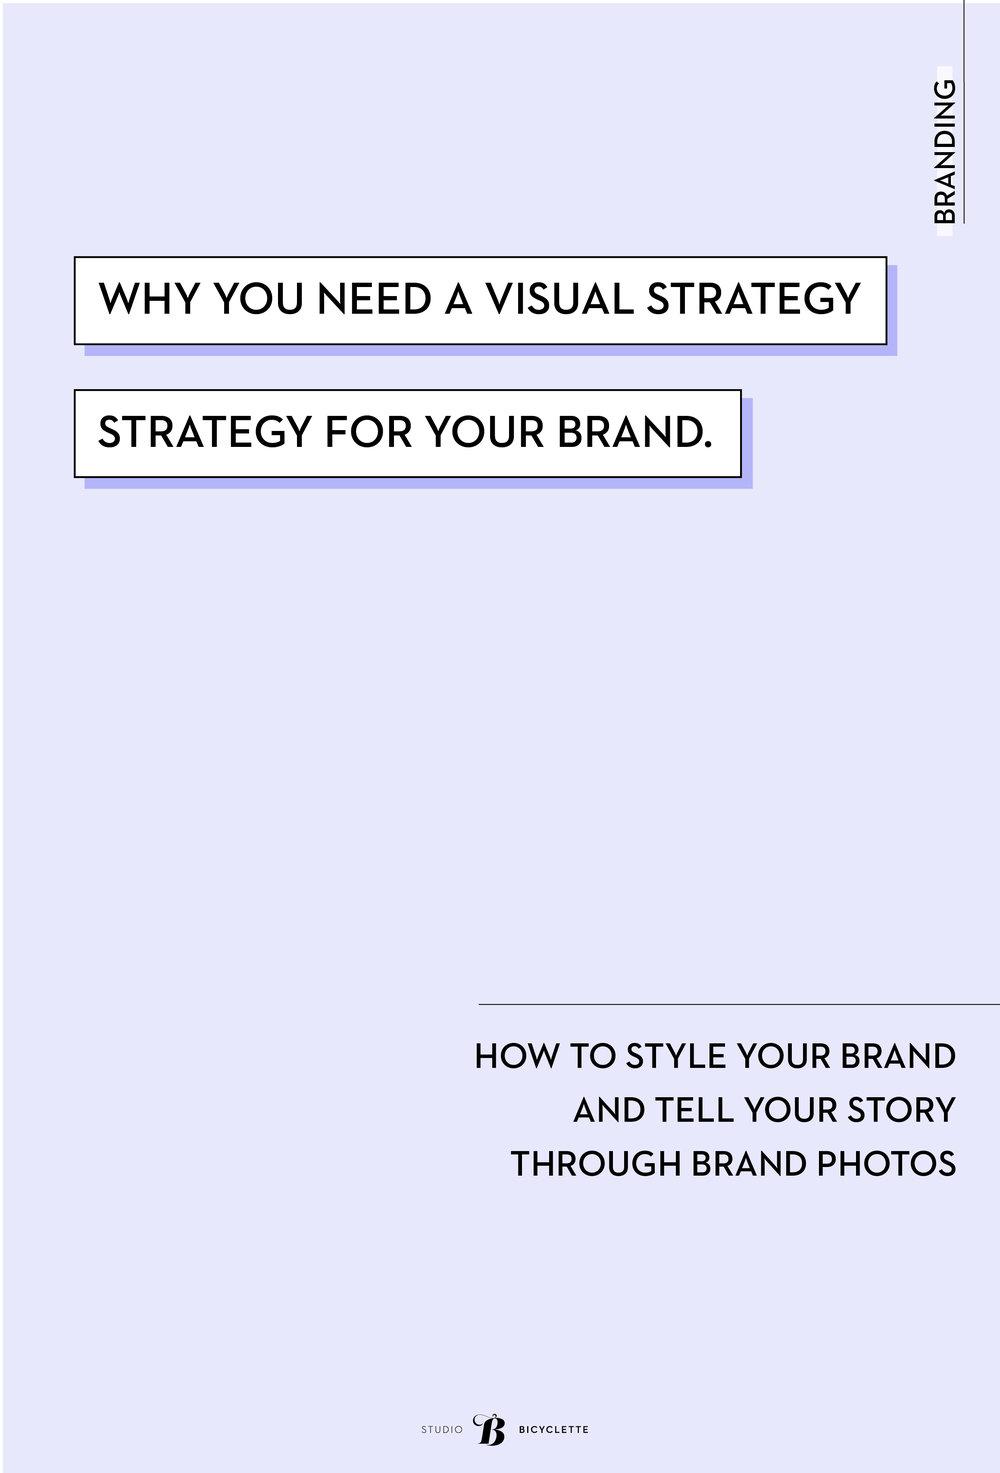 WhyVisualStrategy.jpg